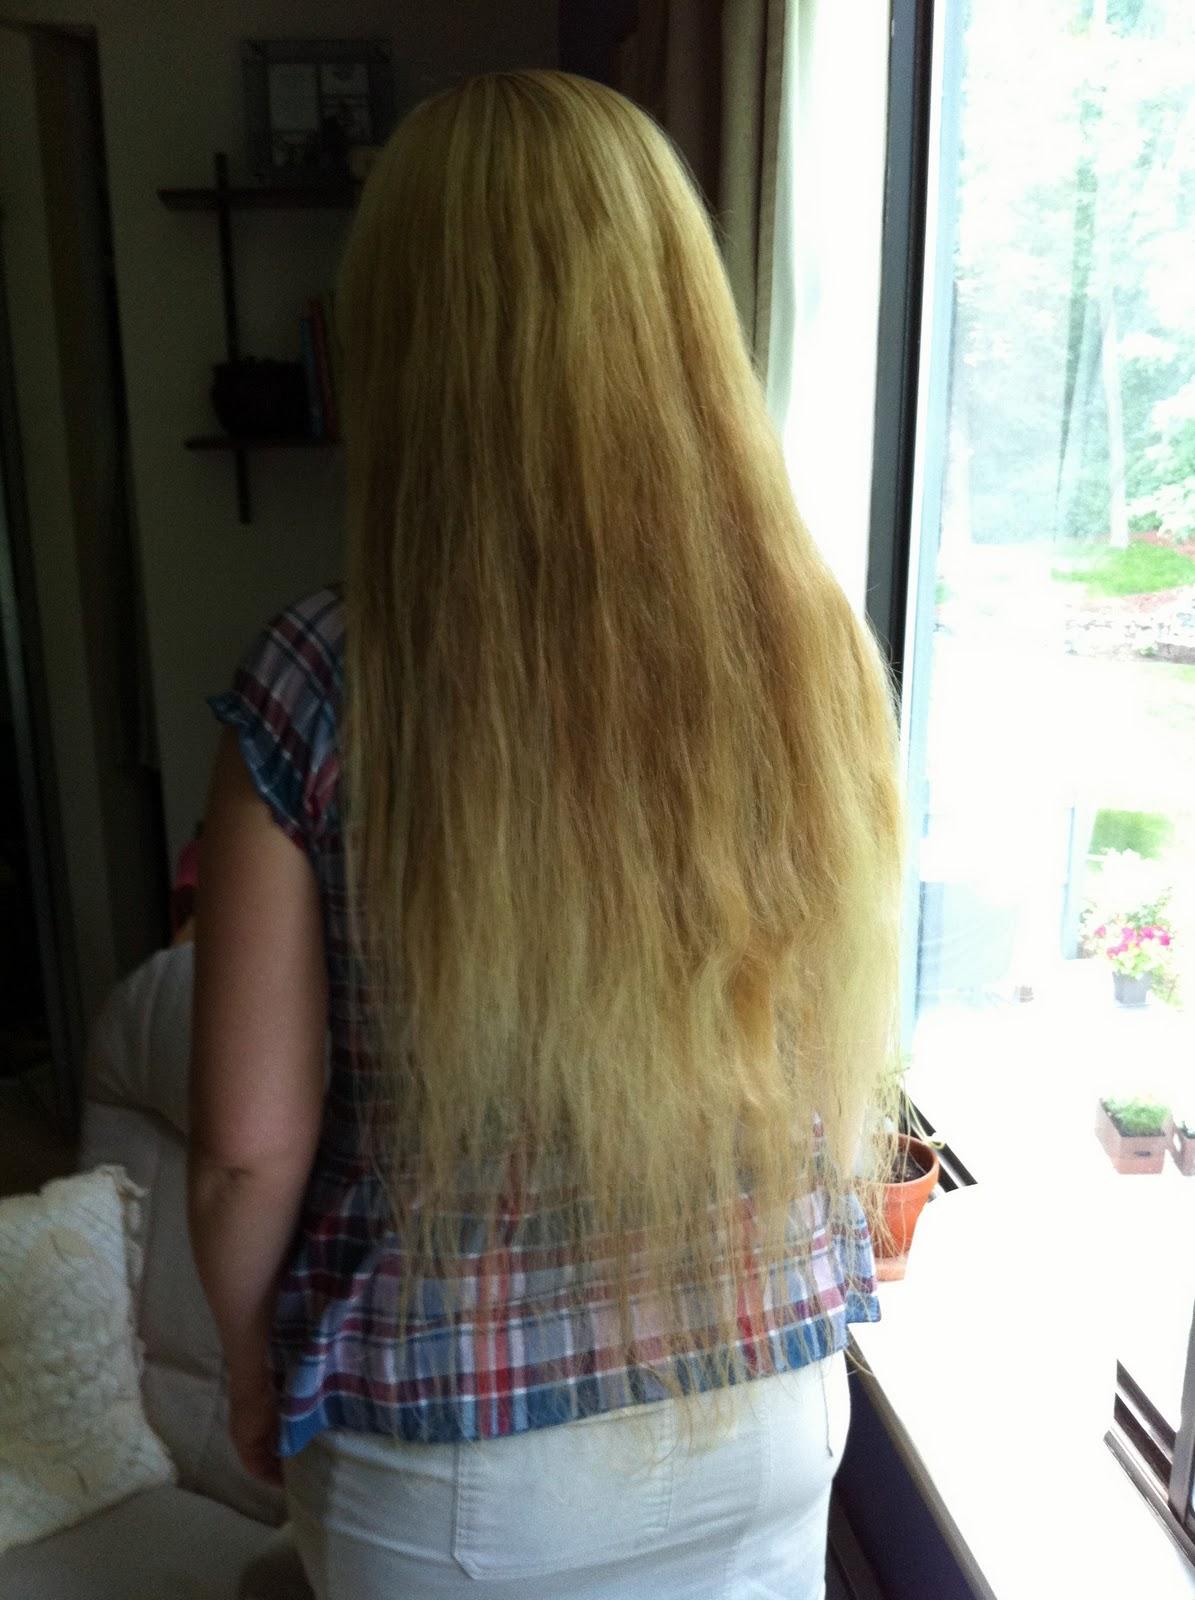 Twinkling Along: A Hair Raising Tale: My Long Hair Goal